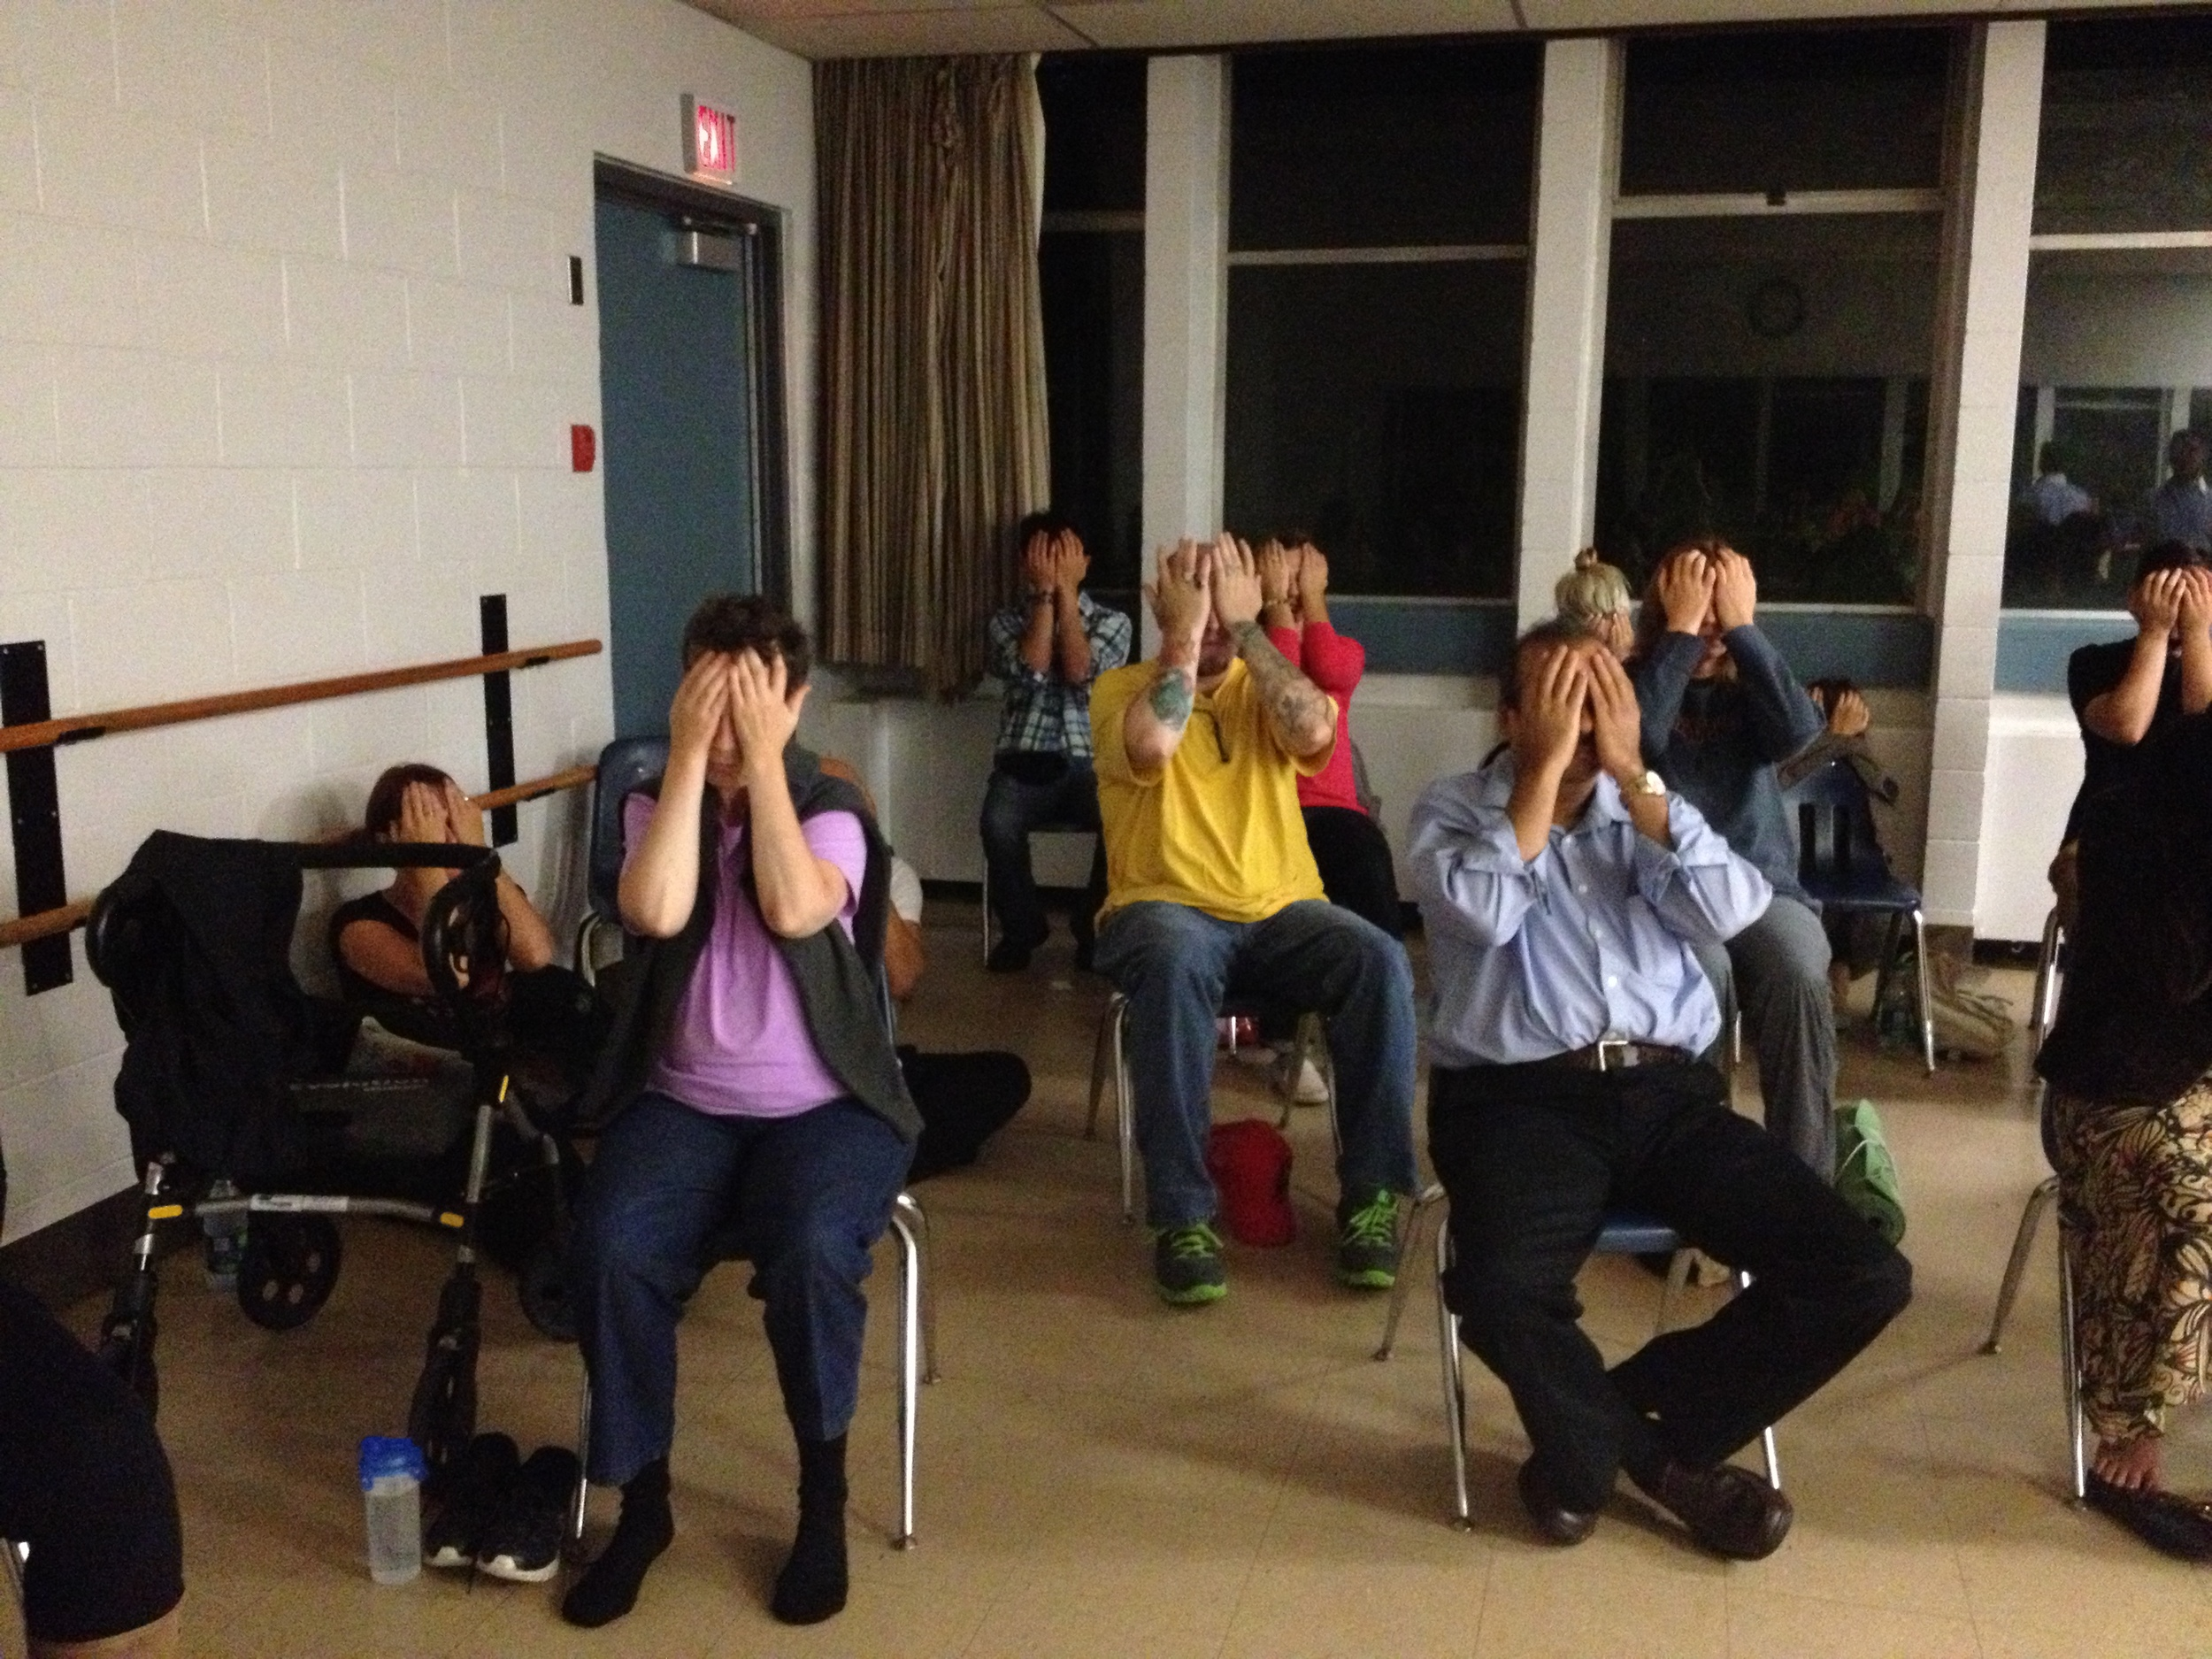 Chandresh's meditation session at Renfrew Community Center, Vancouver BC